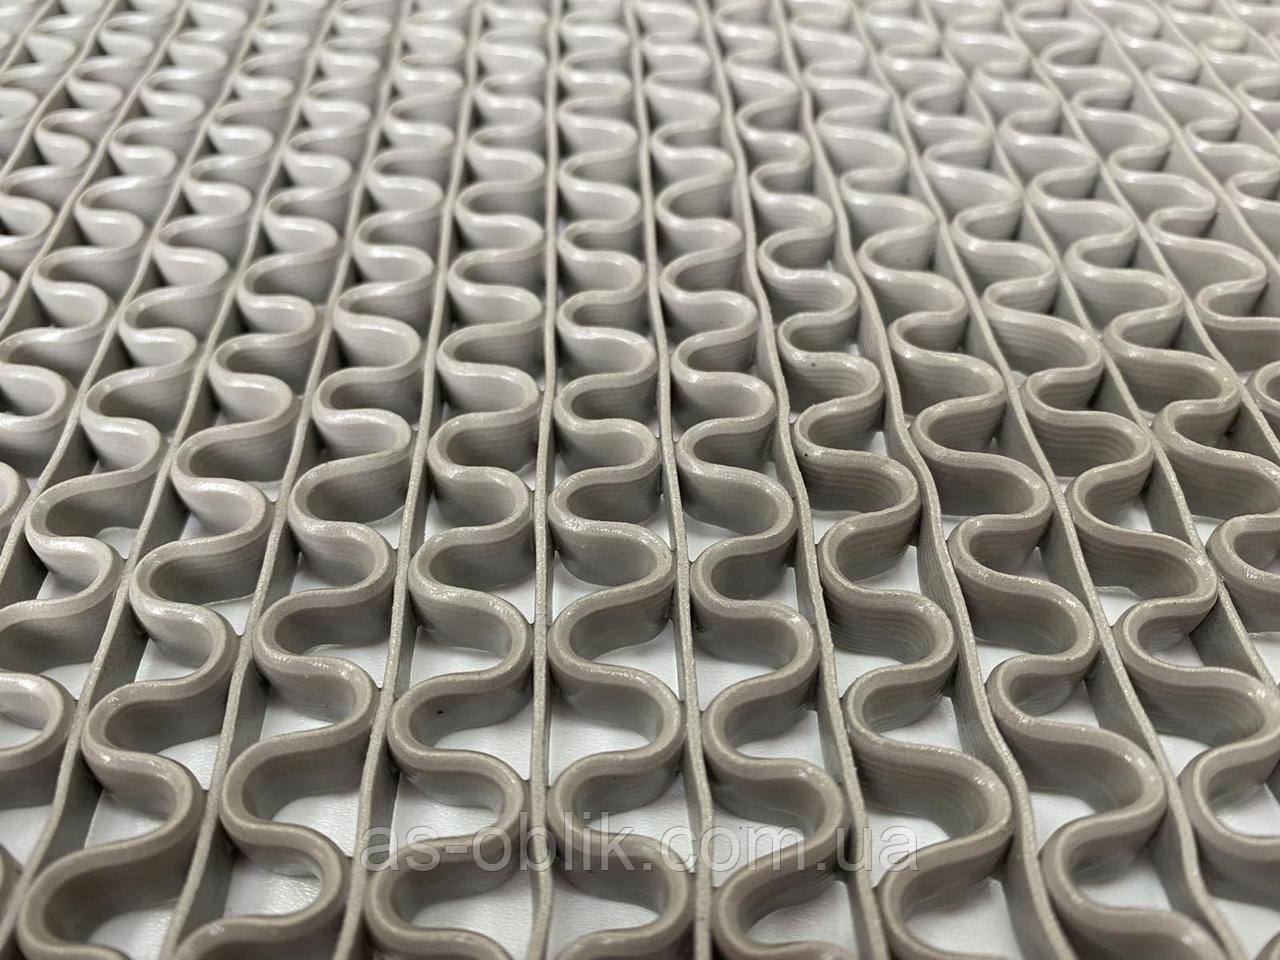 Ковер резиновый 120х46 см, серый